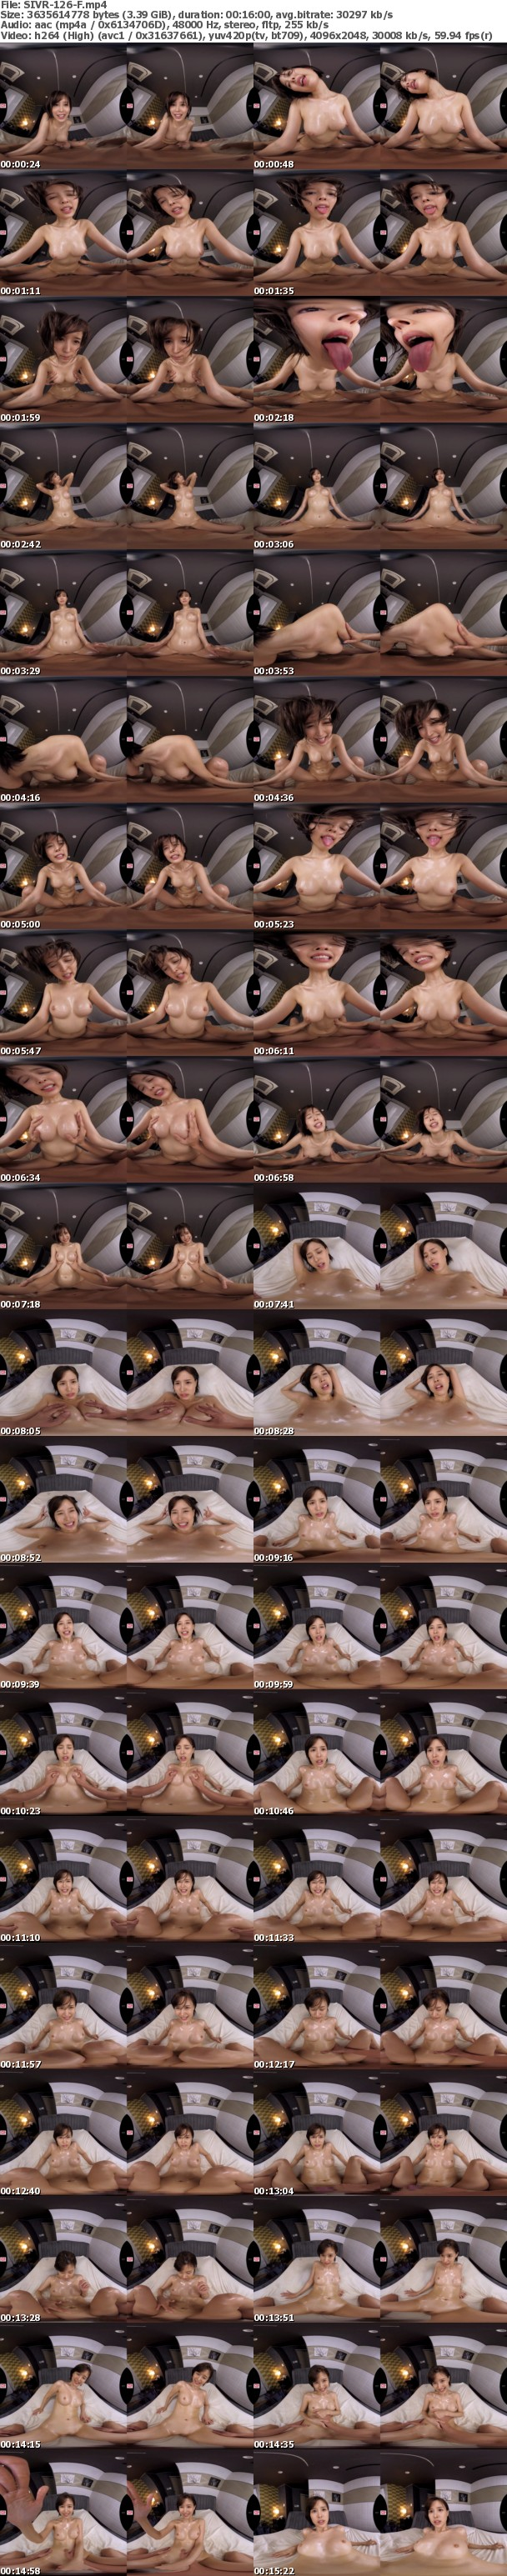 (VR) SIVR-126 女上司と相部屋VR 仕事オフモードの無防備なホロ酔い姿に性欲のタガが外れて一晩中ヤリまくった一部始終 葵つかさ